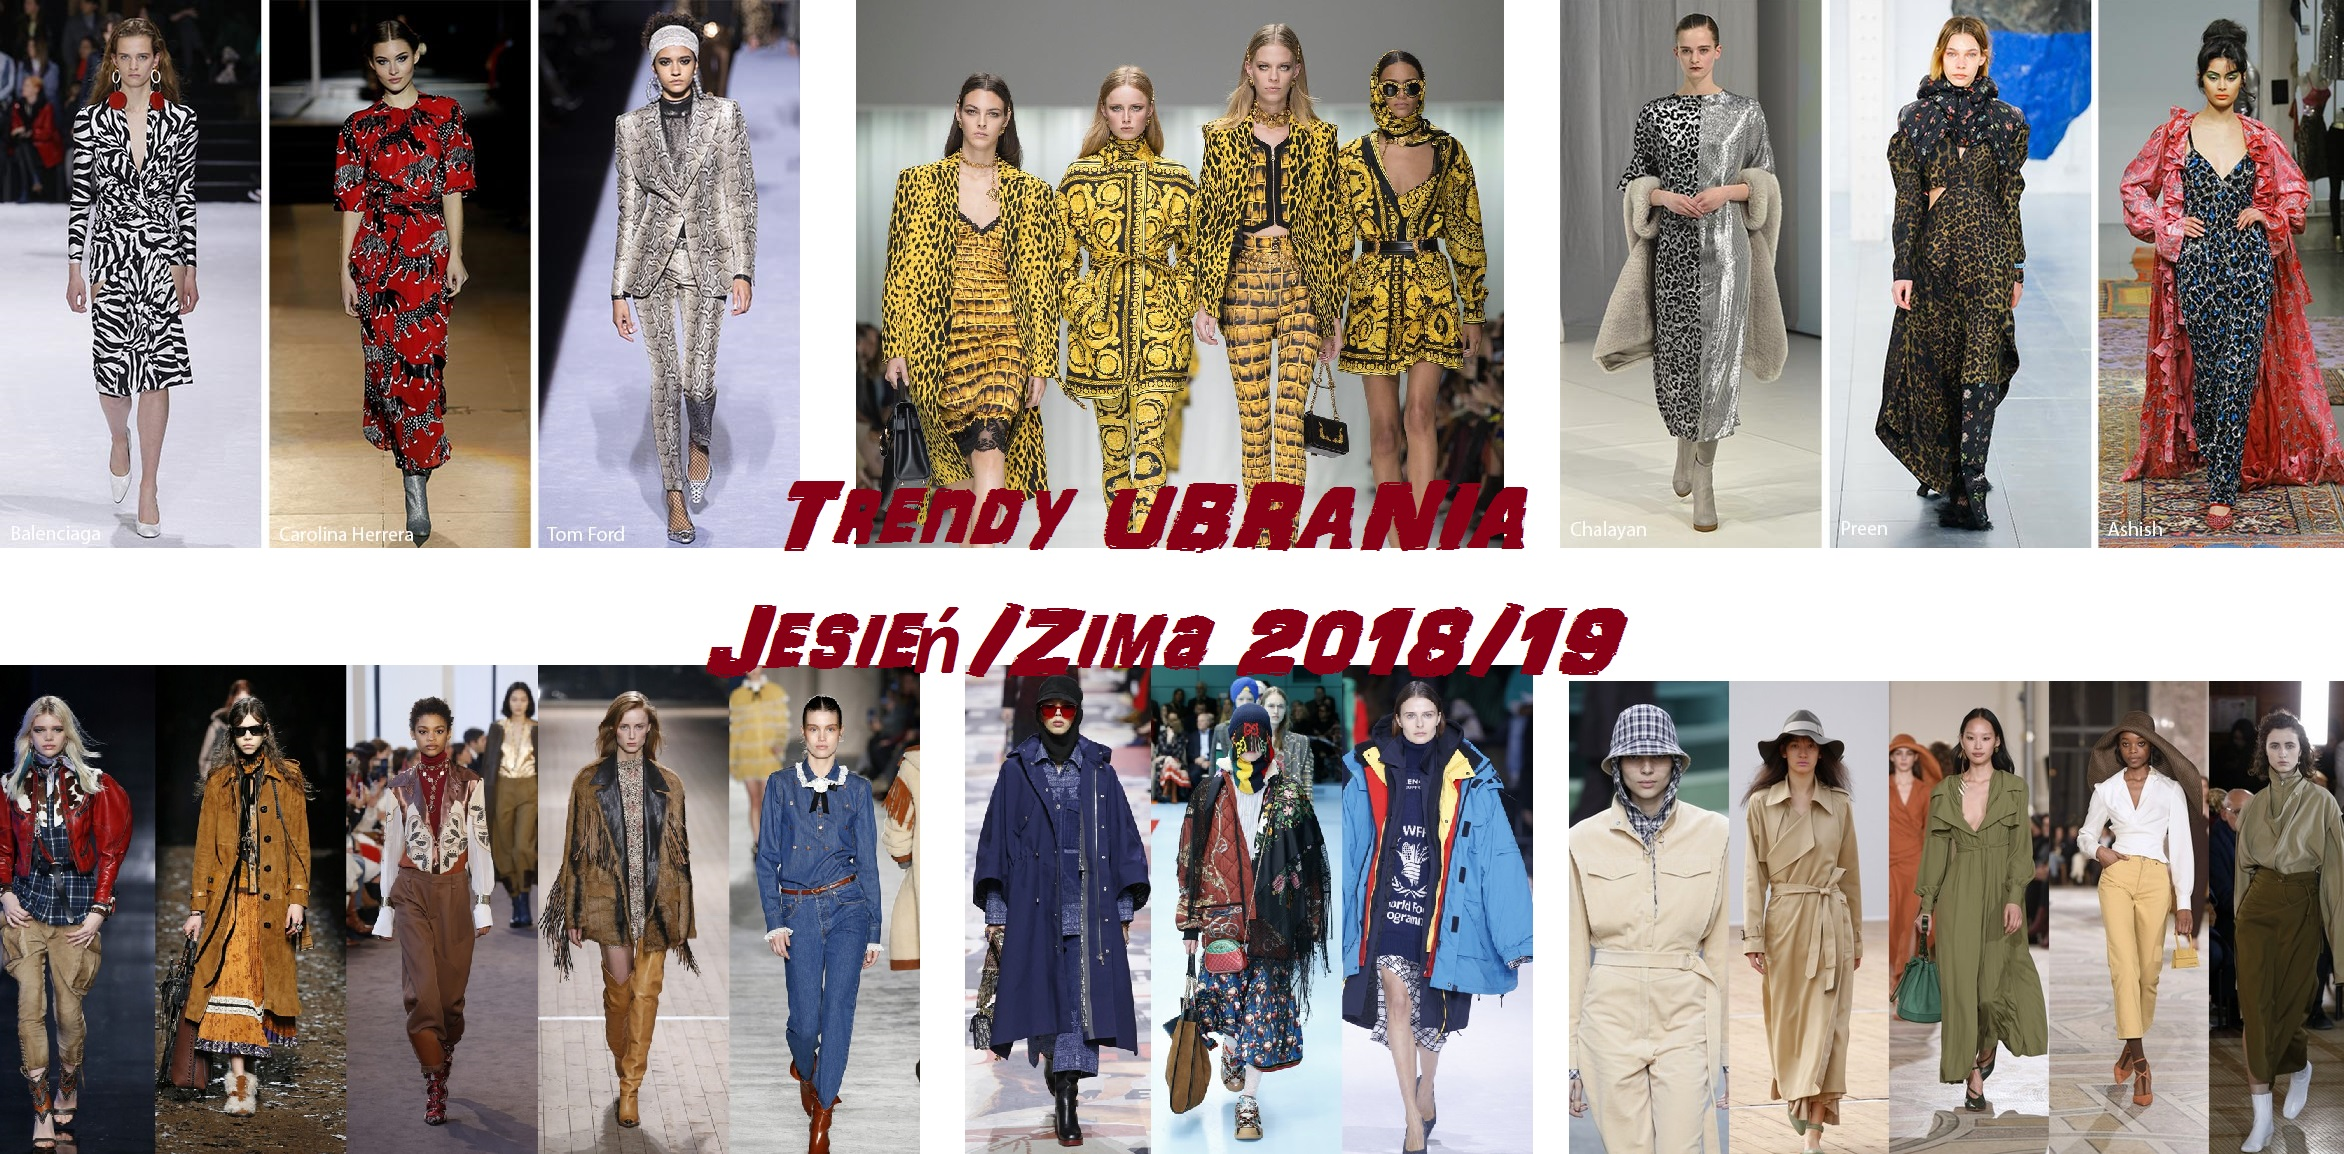 trendy-jesie%C5%84-zima-2018-2019.jpg